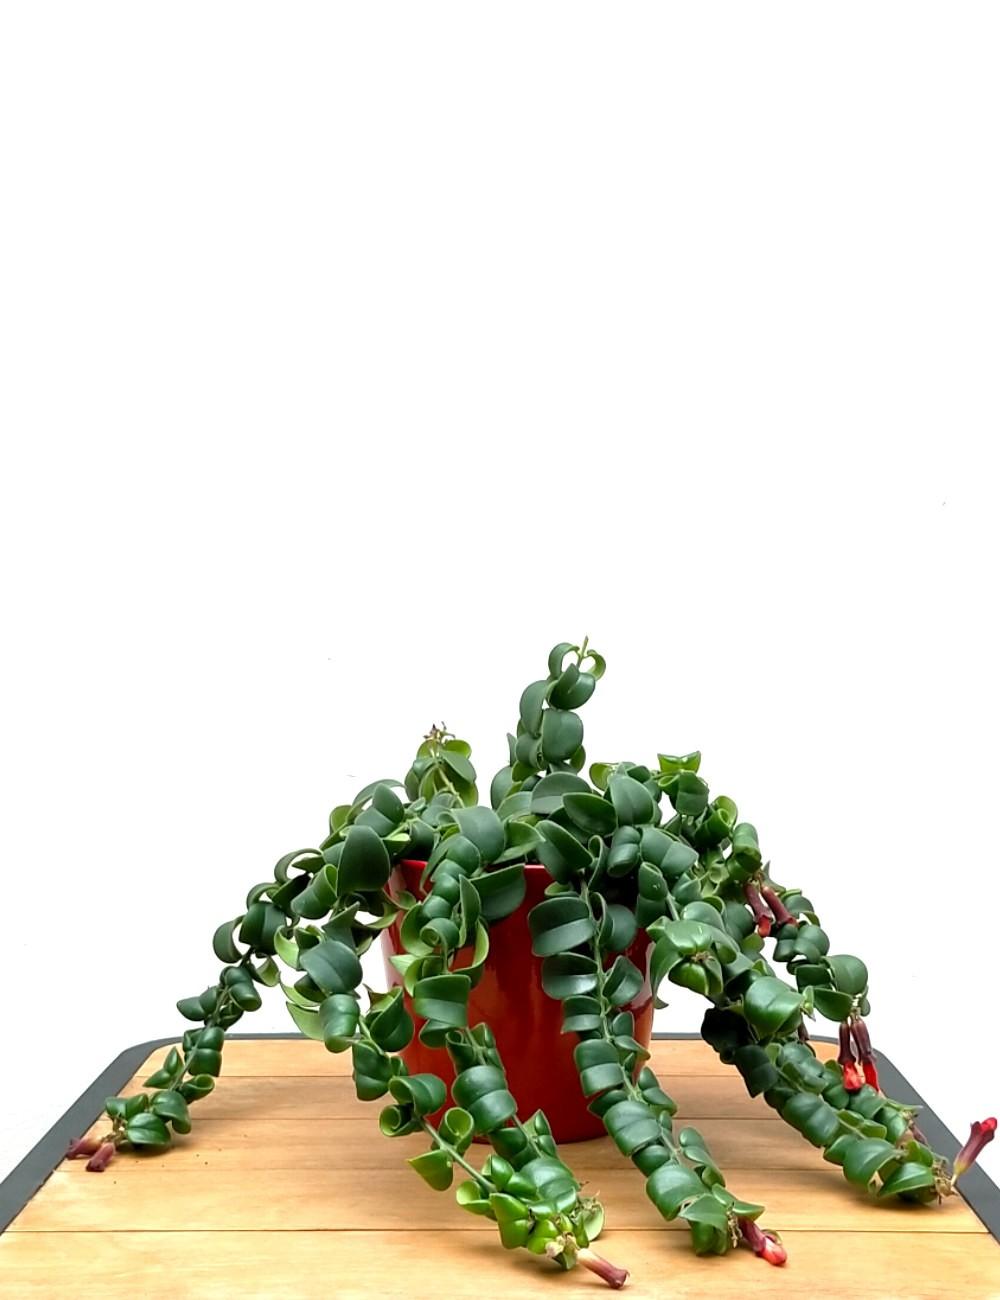 Aeschynanthus Ø Vaso 15 cm Indoor Flowering Plants Shop Online